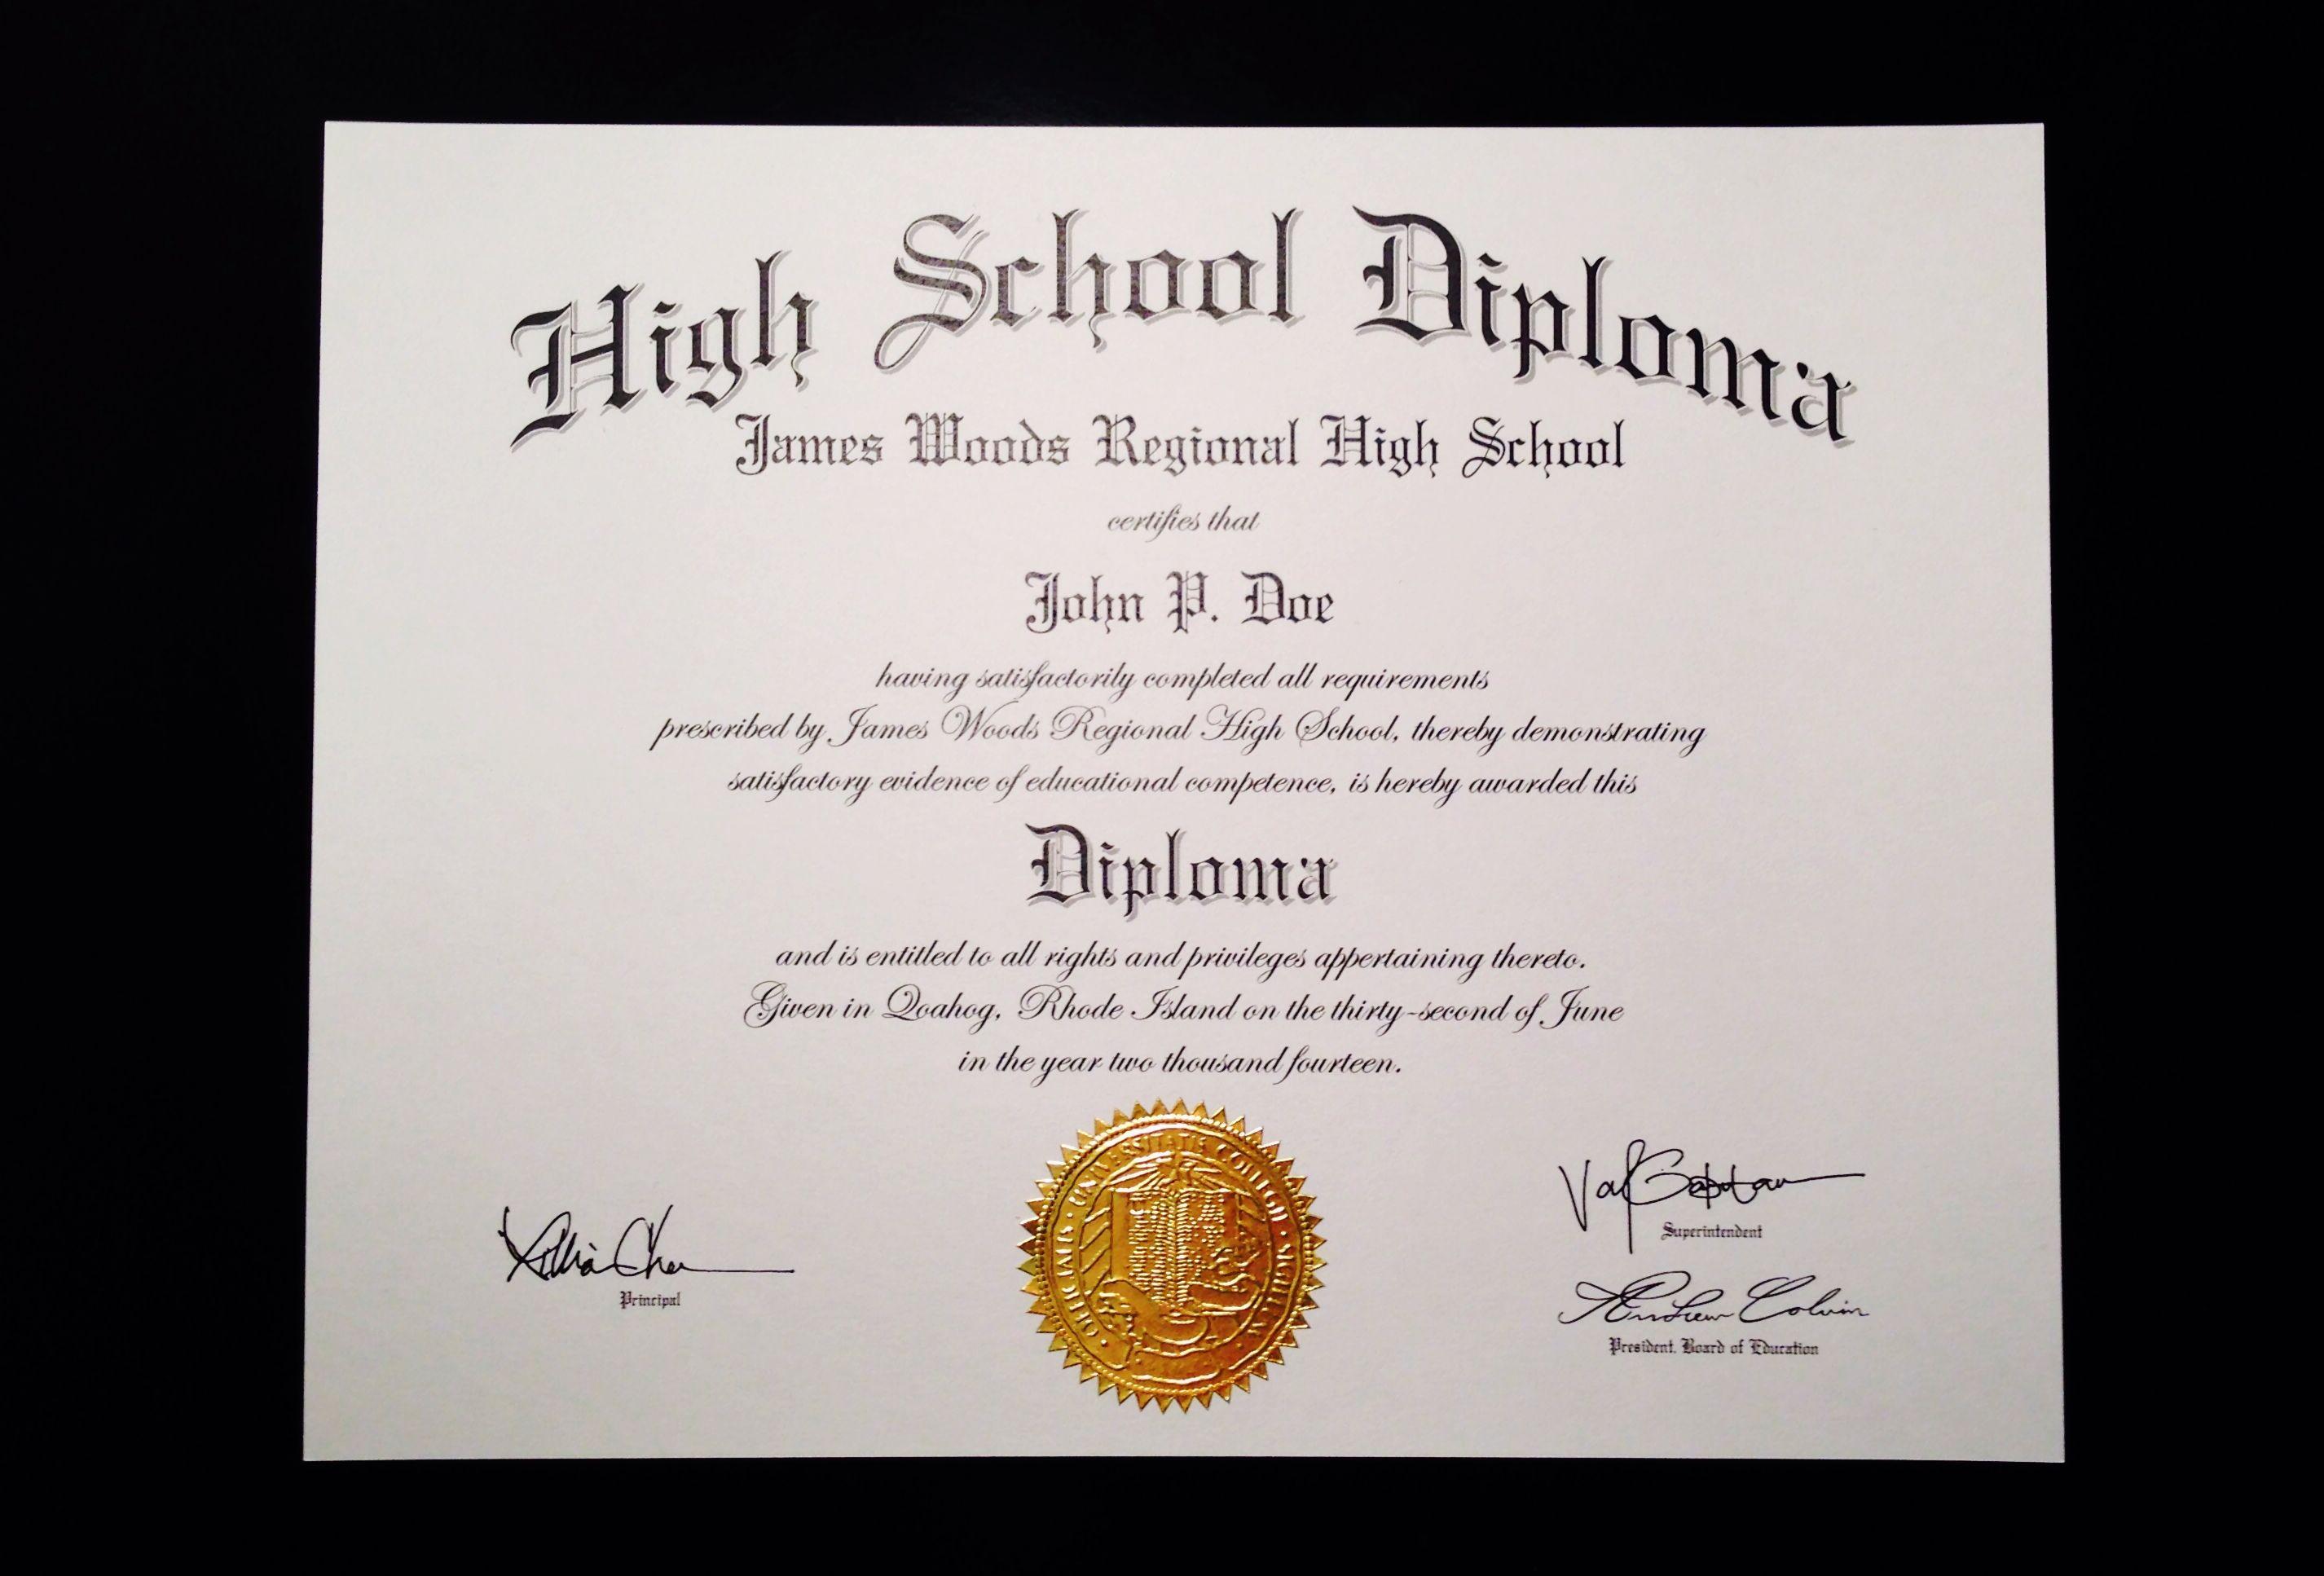 School Certificate Template Free Printable Certificates   Diploma - Printable Fake Ged Certificate For Free